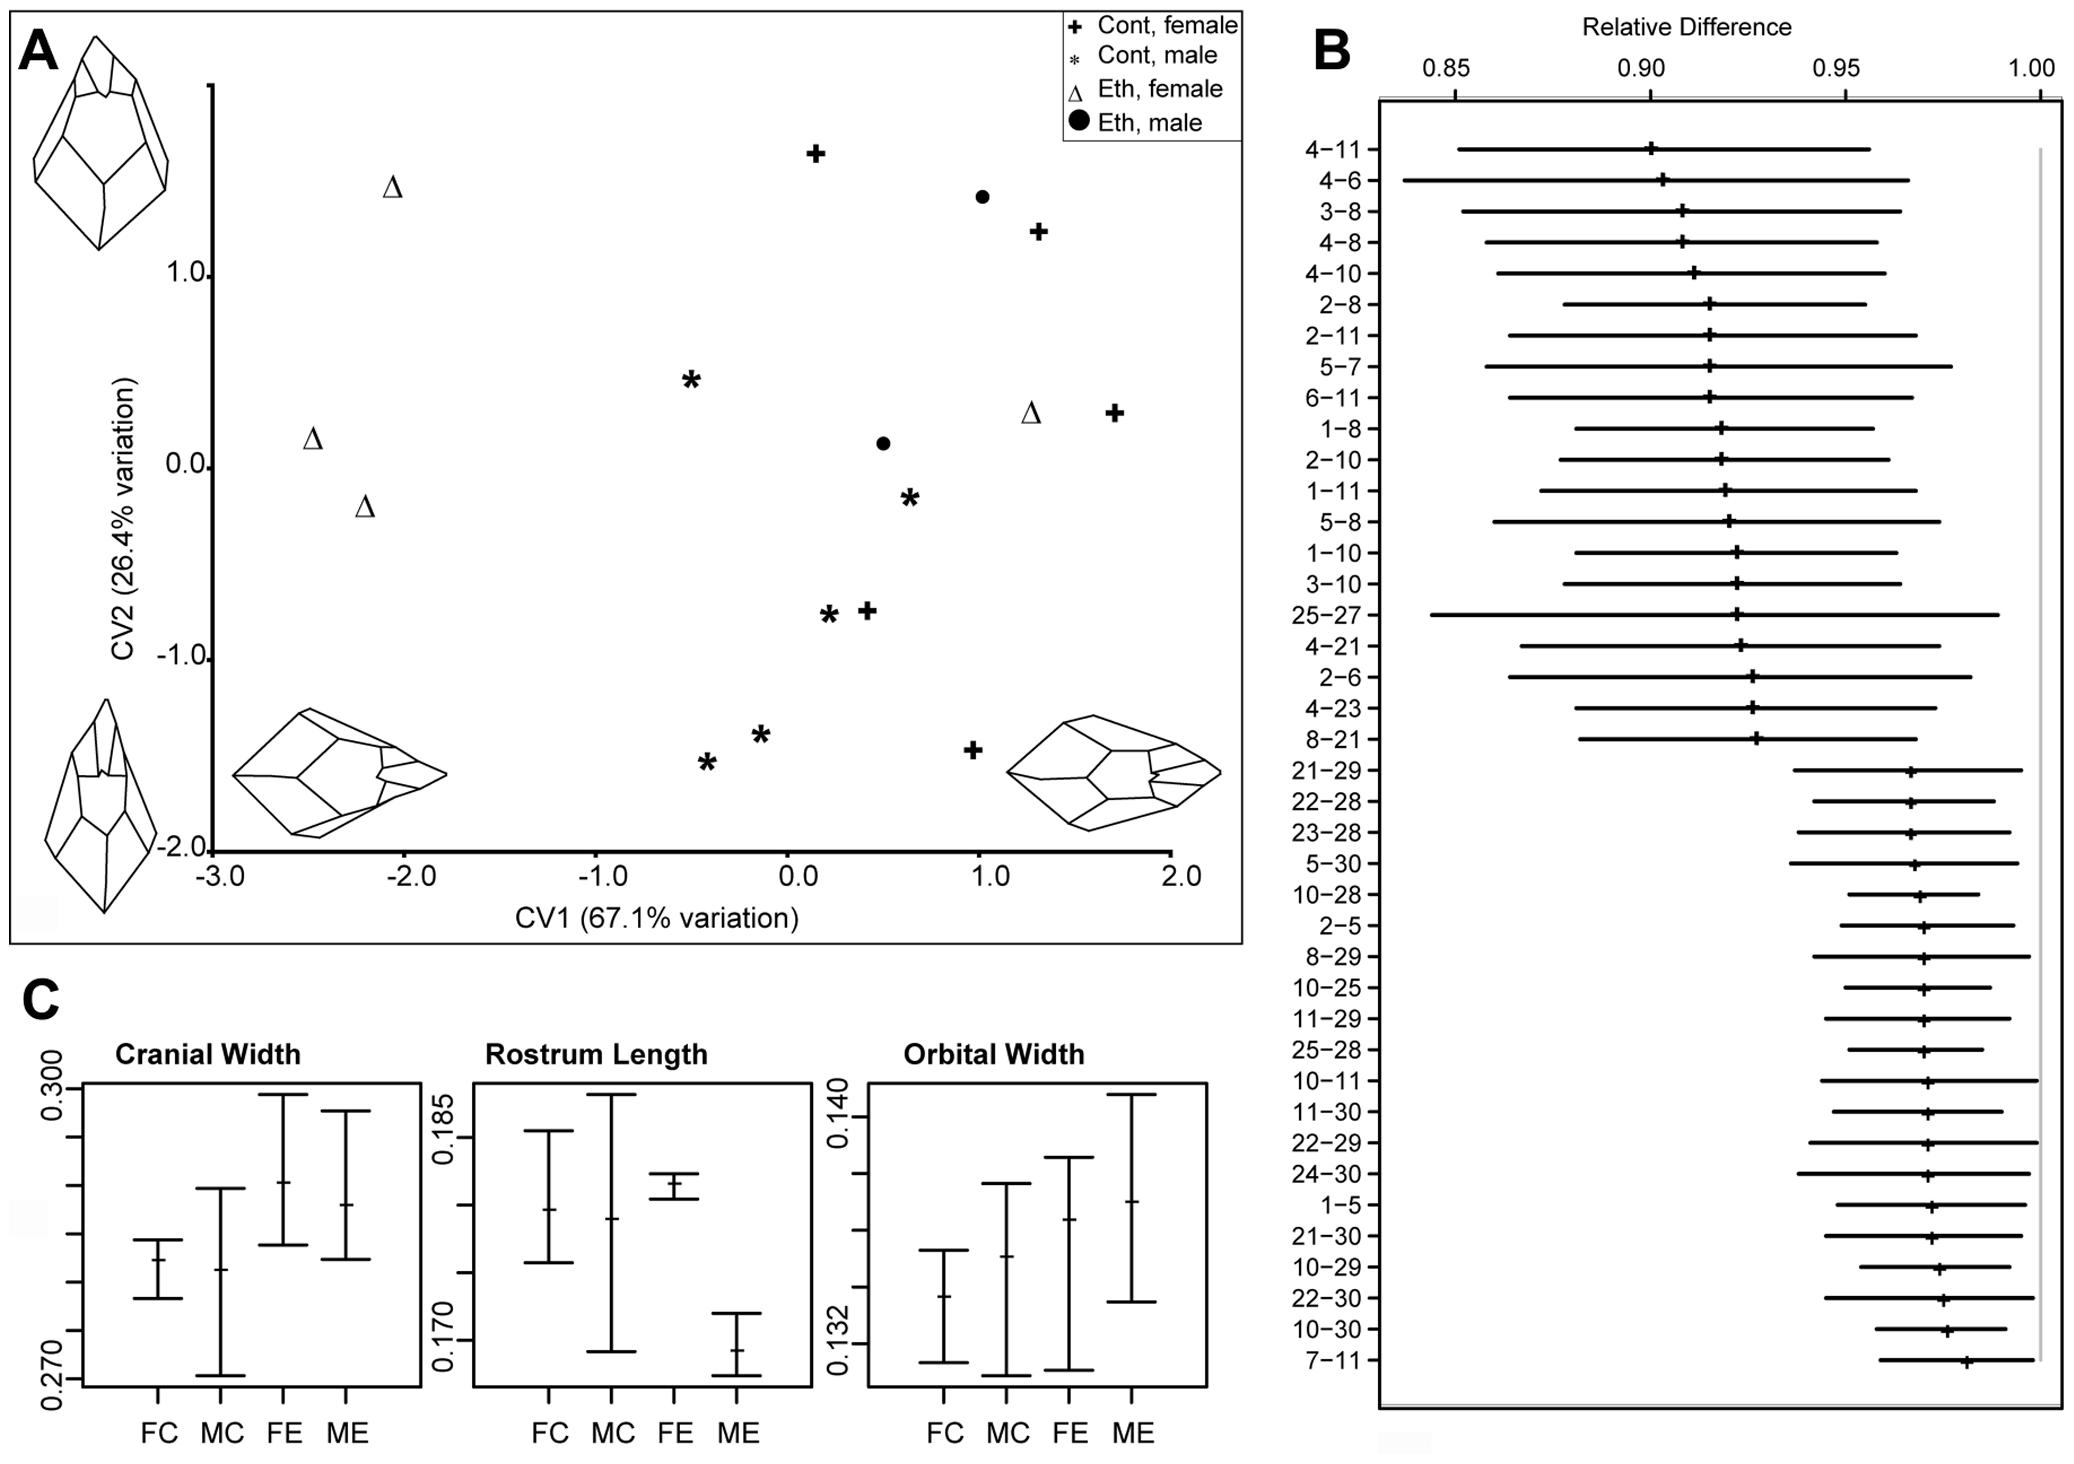 Quantitative analysis of the effects of gestational exposure to ethanol on skull shape.